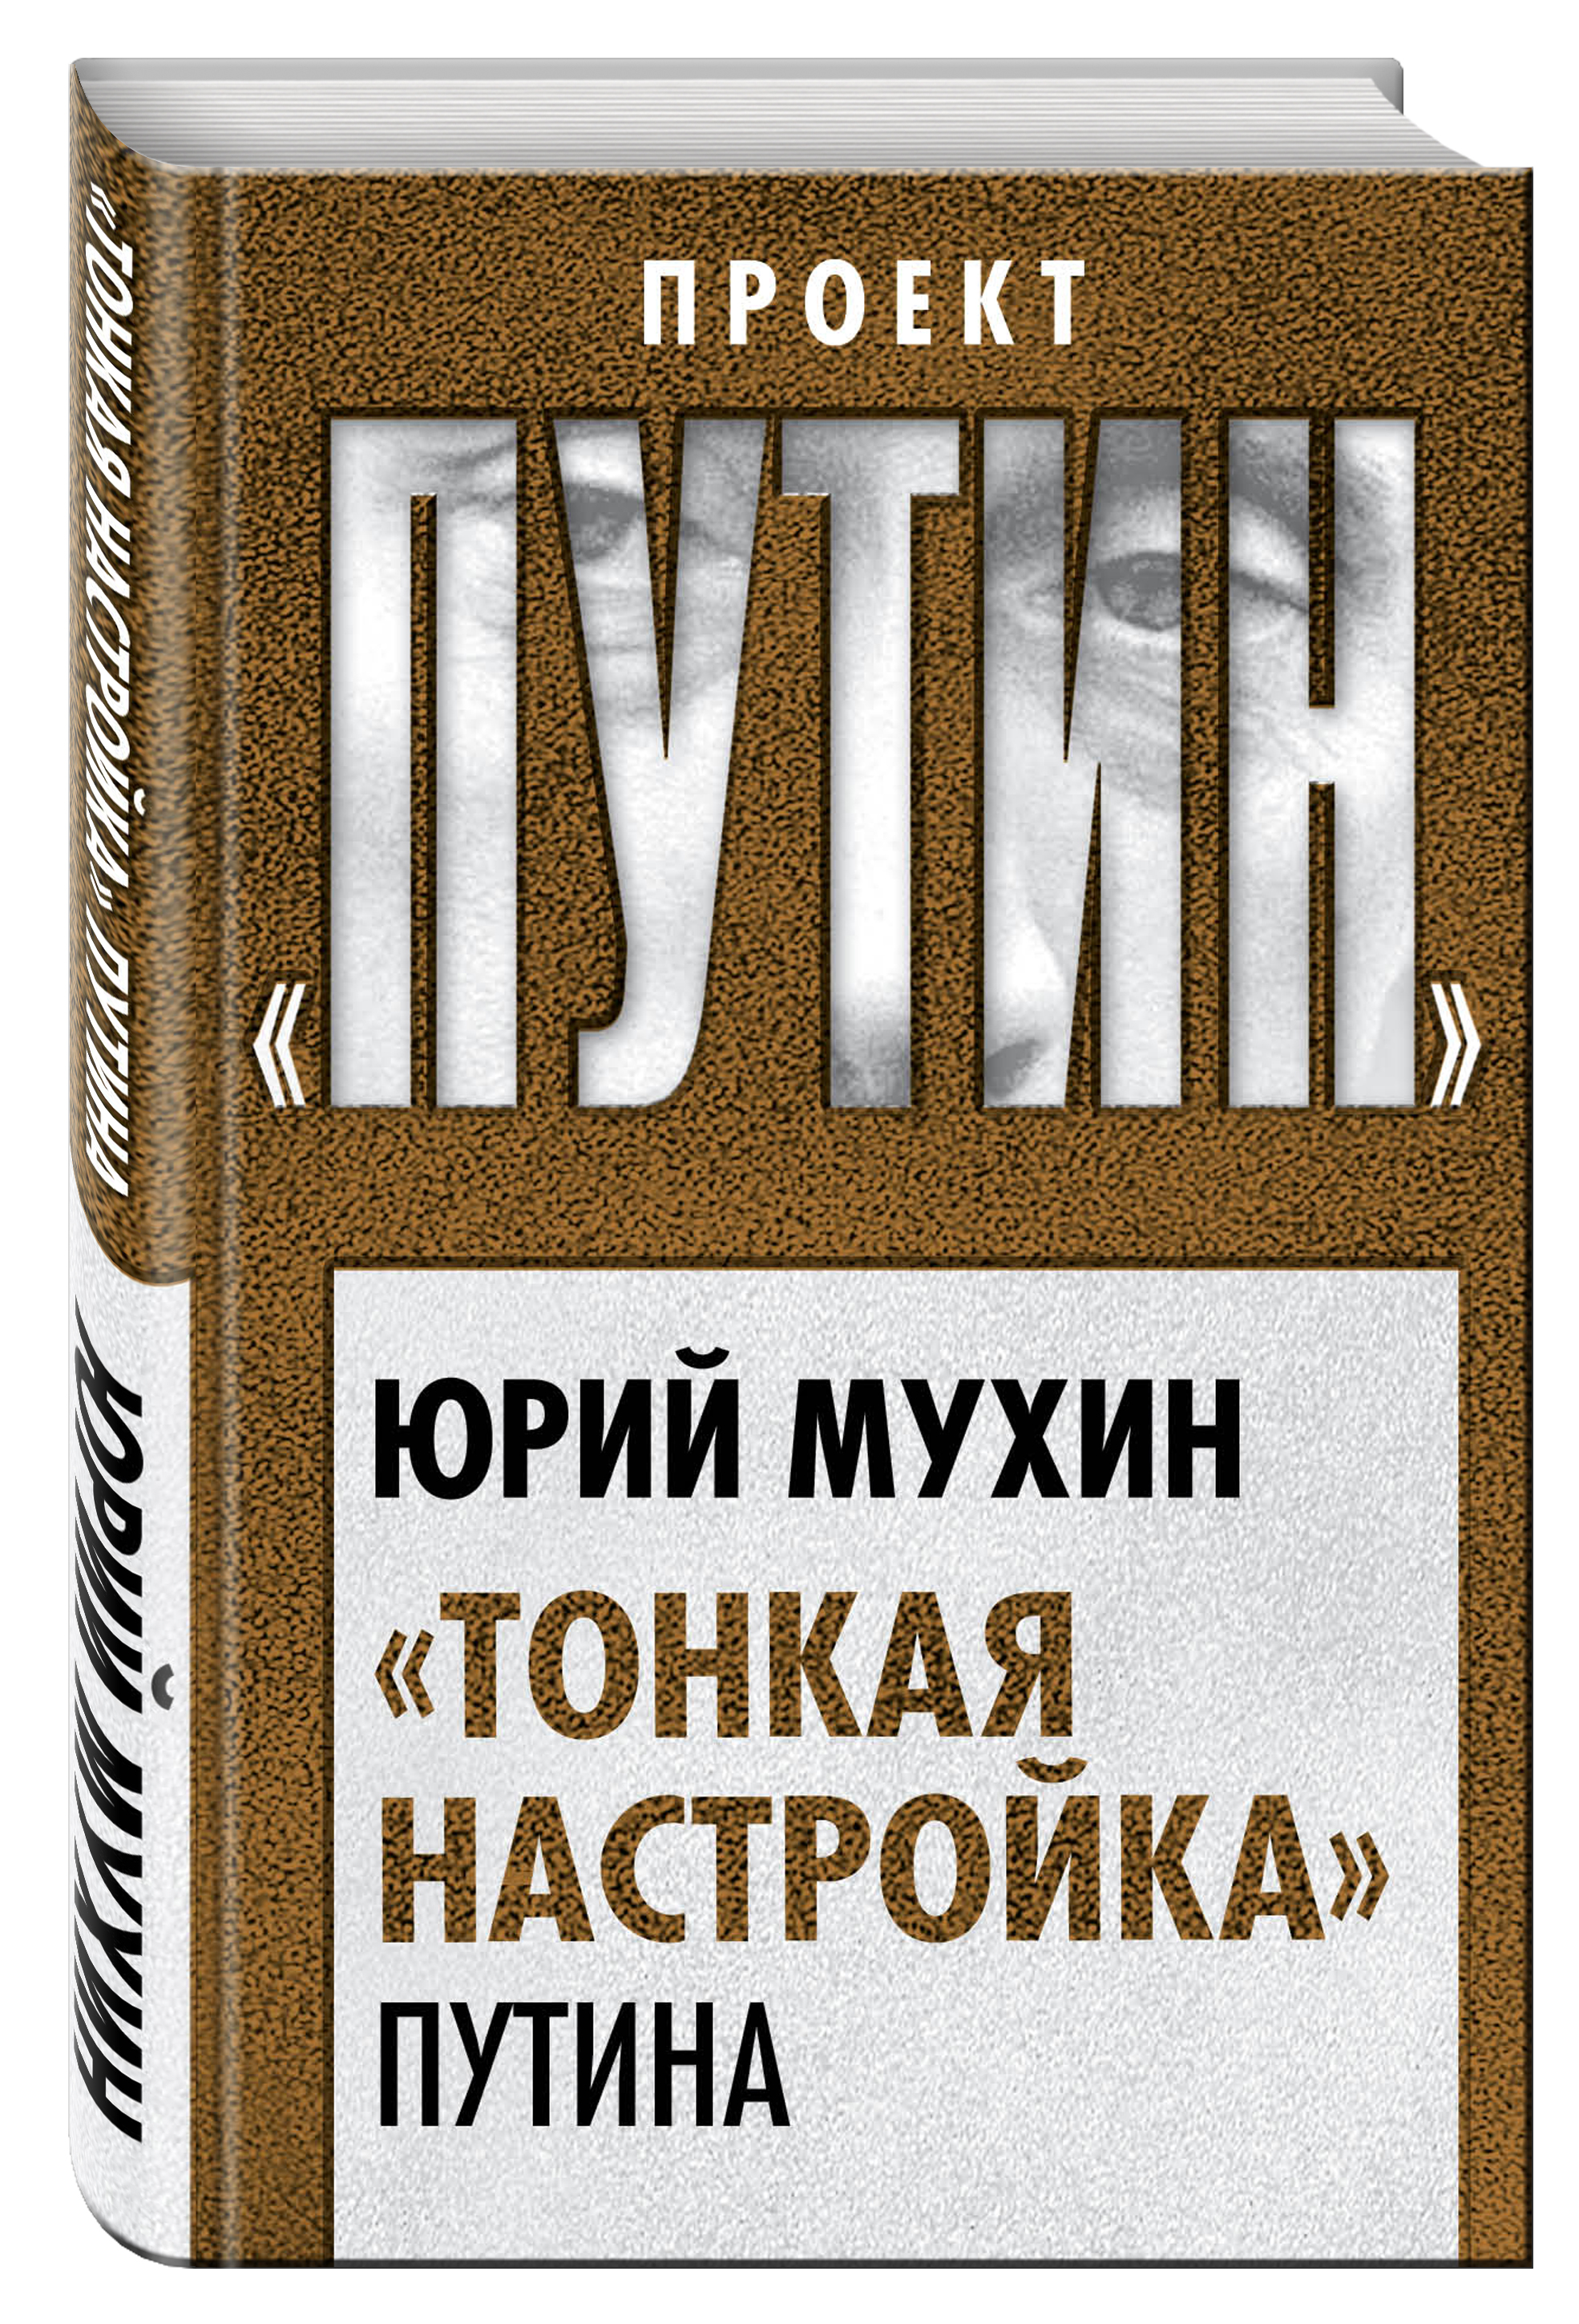 Юрий Мухин «Тонкая настройка» Путина